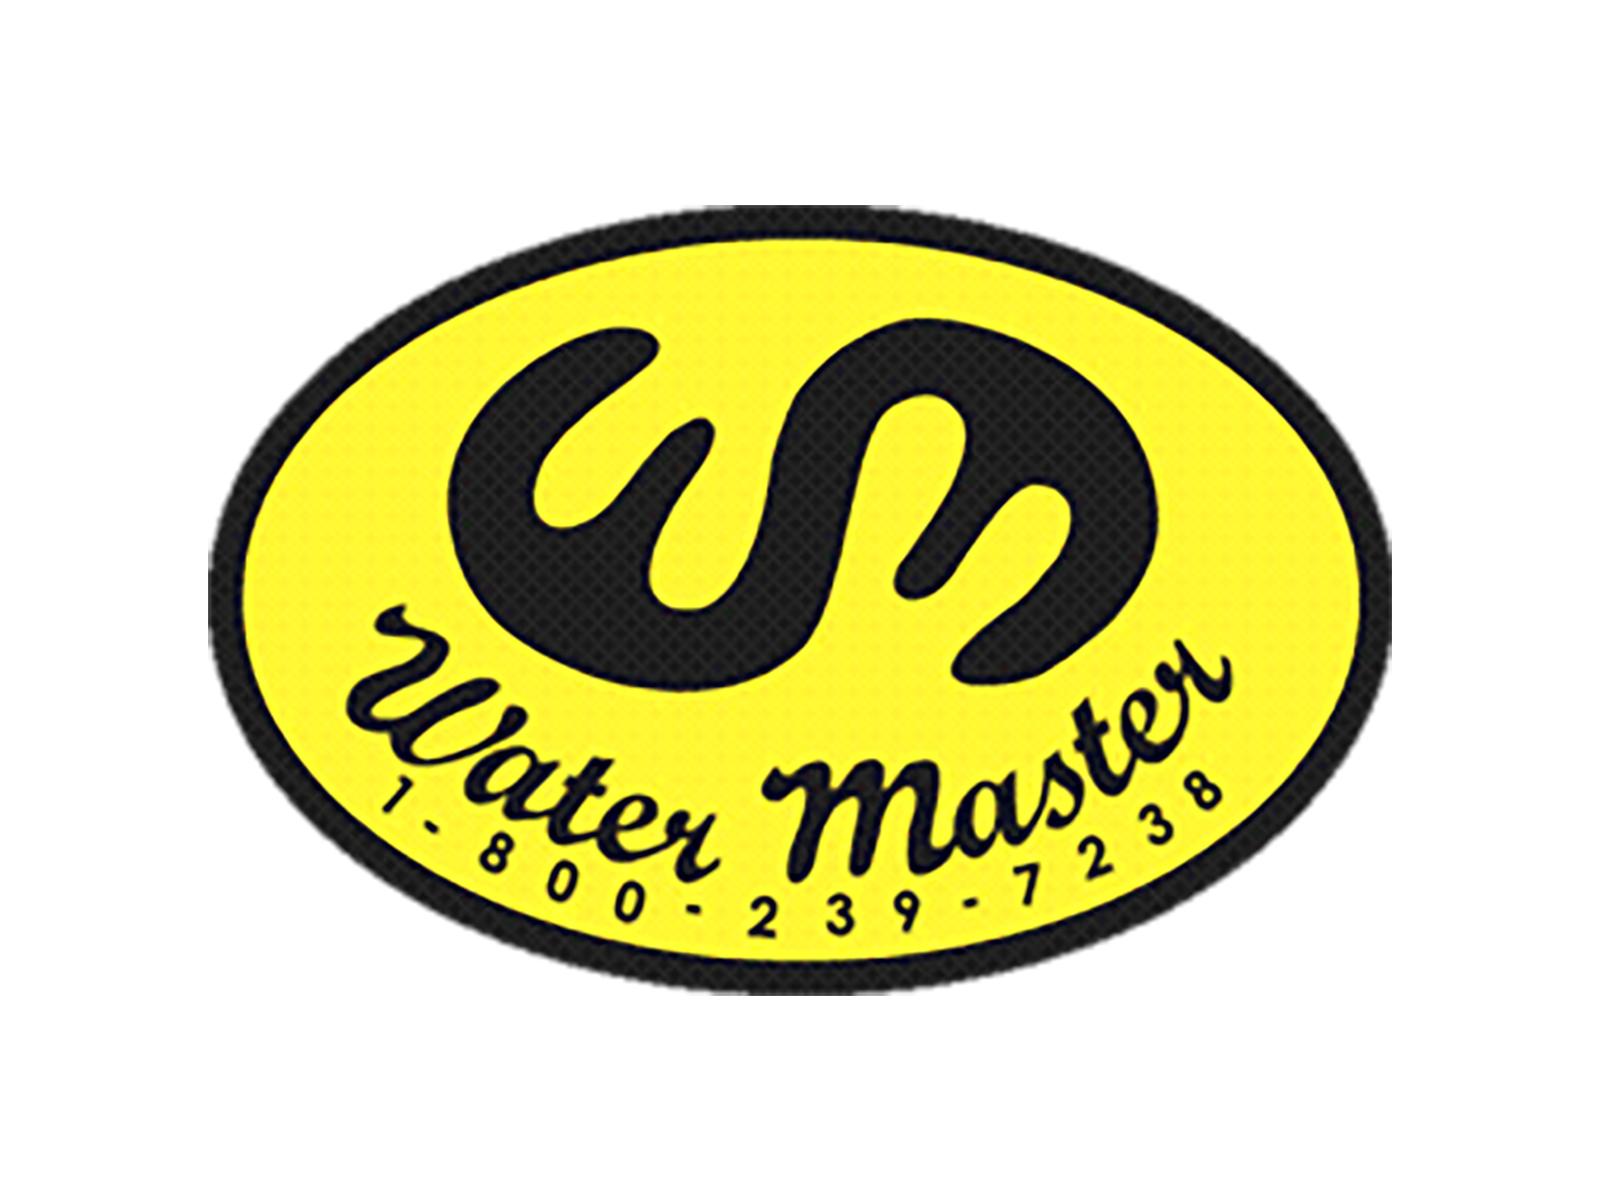 WATER MASTER